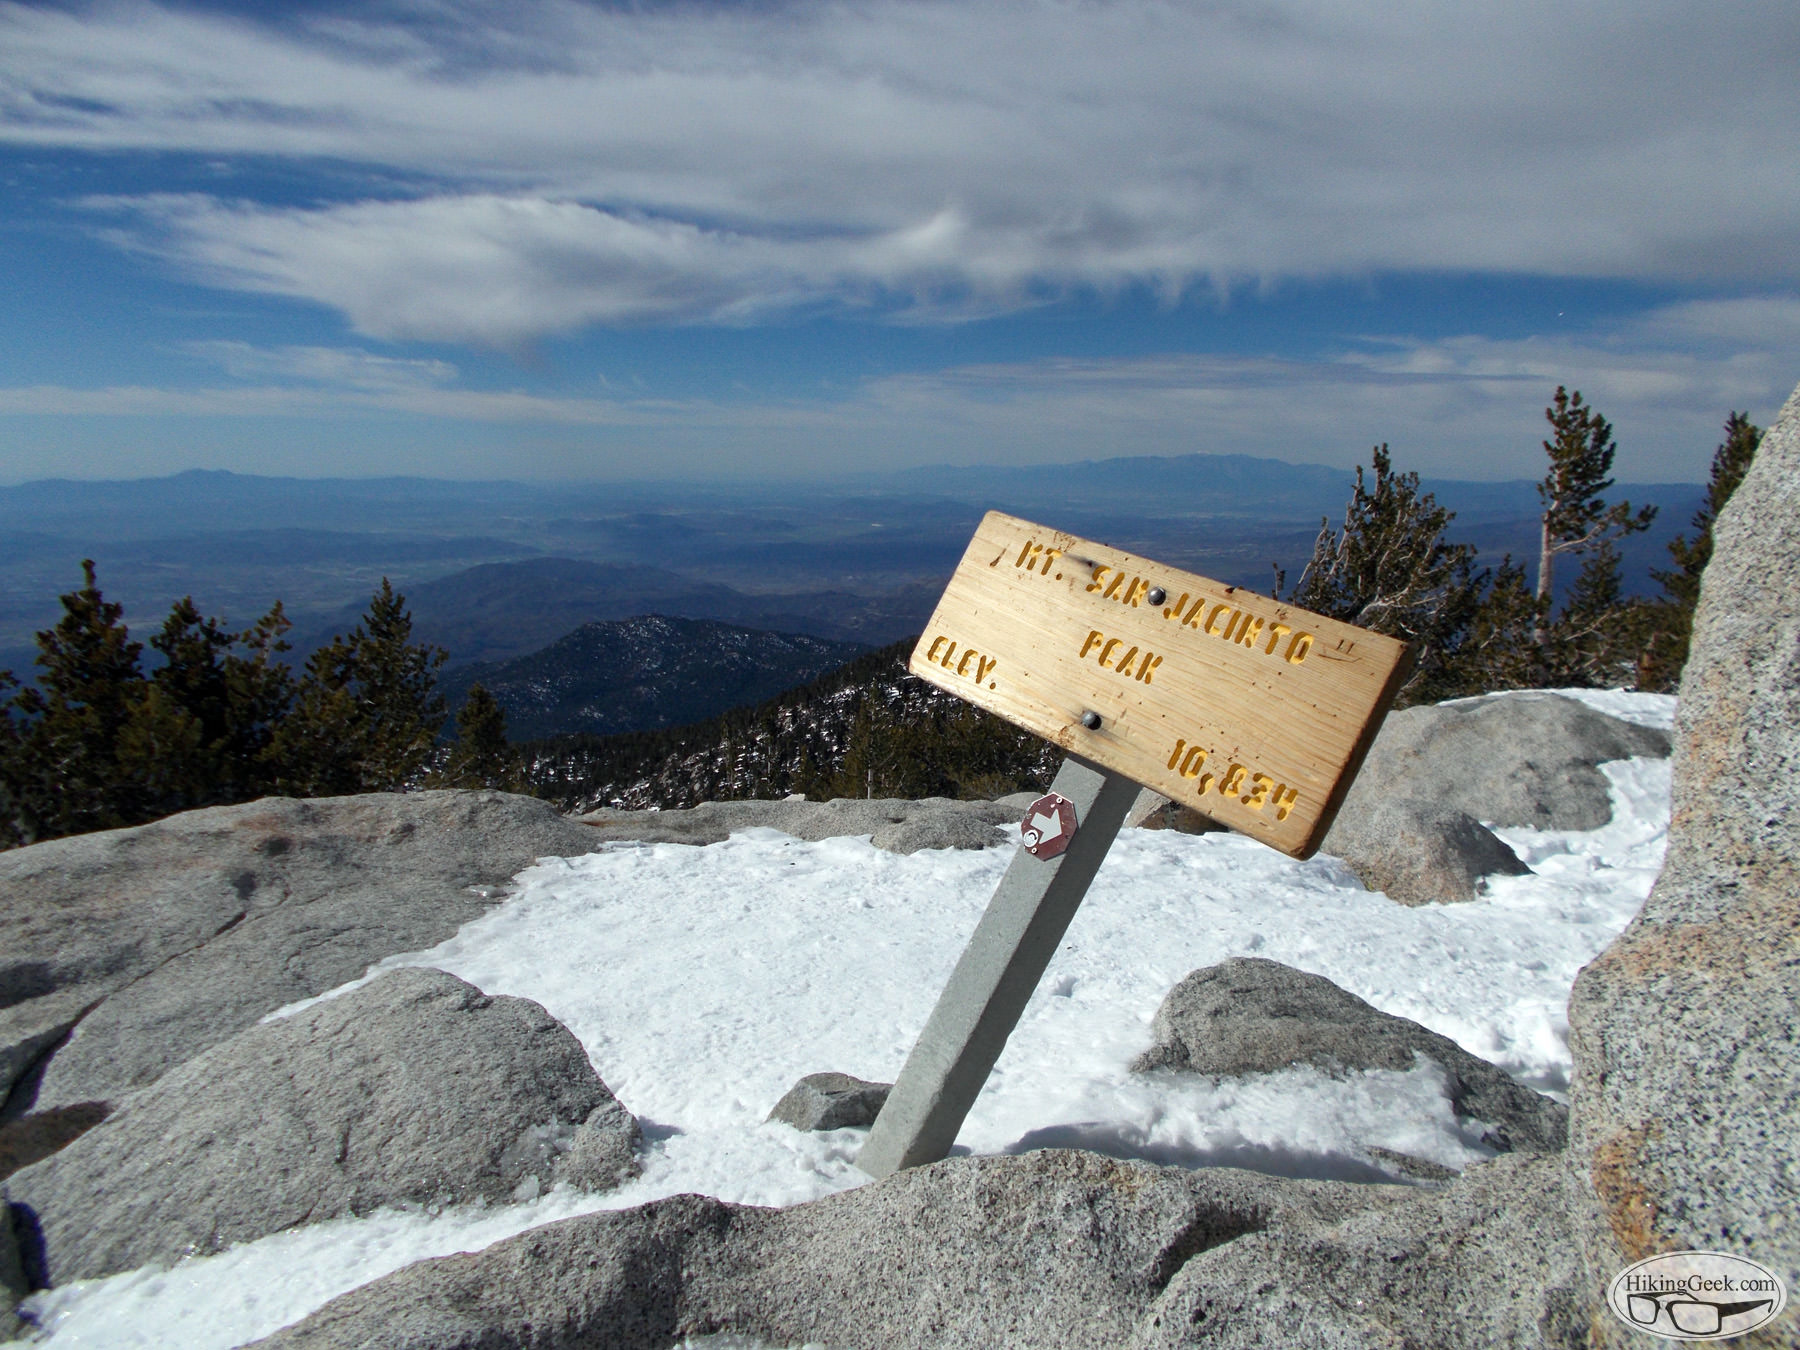 San Jacinto Peak Tramshoe, February 16 2013